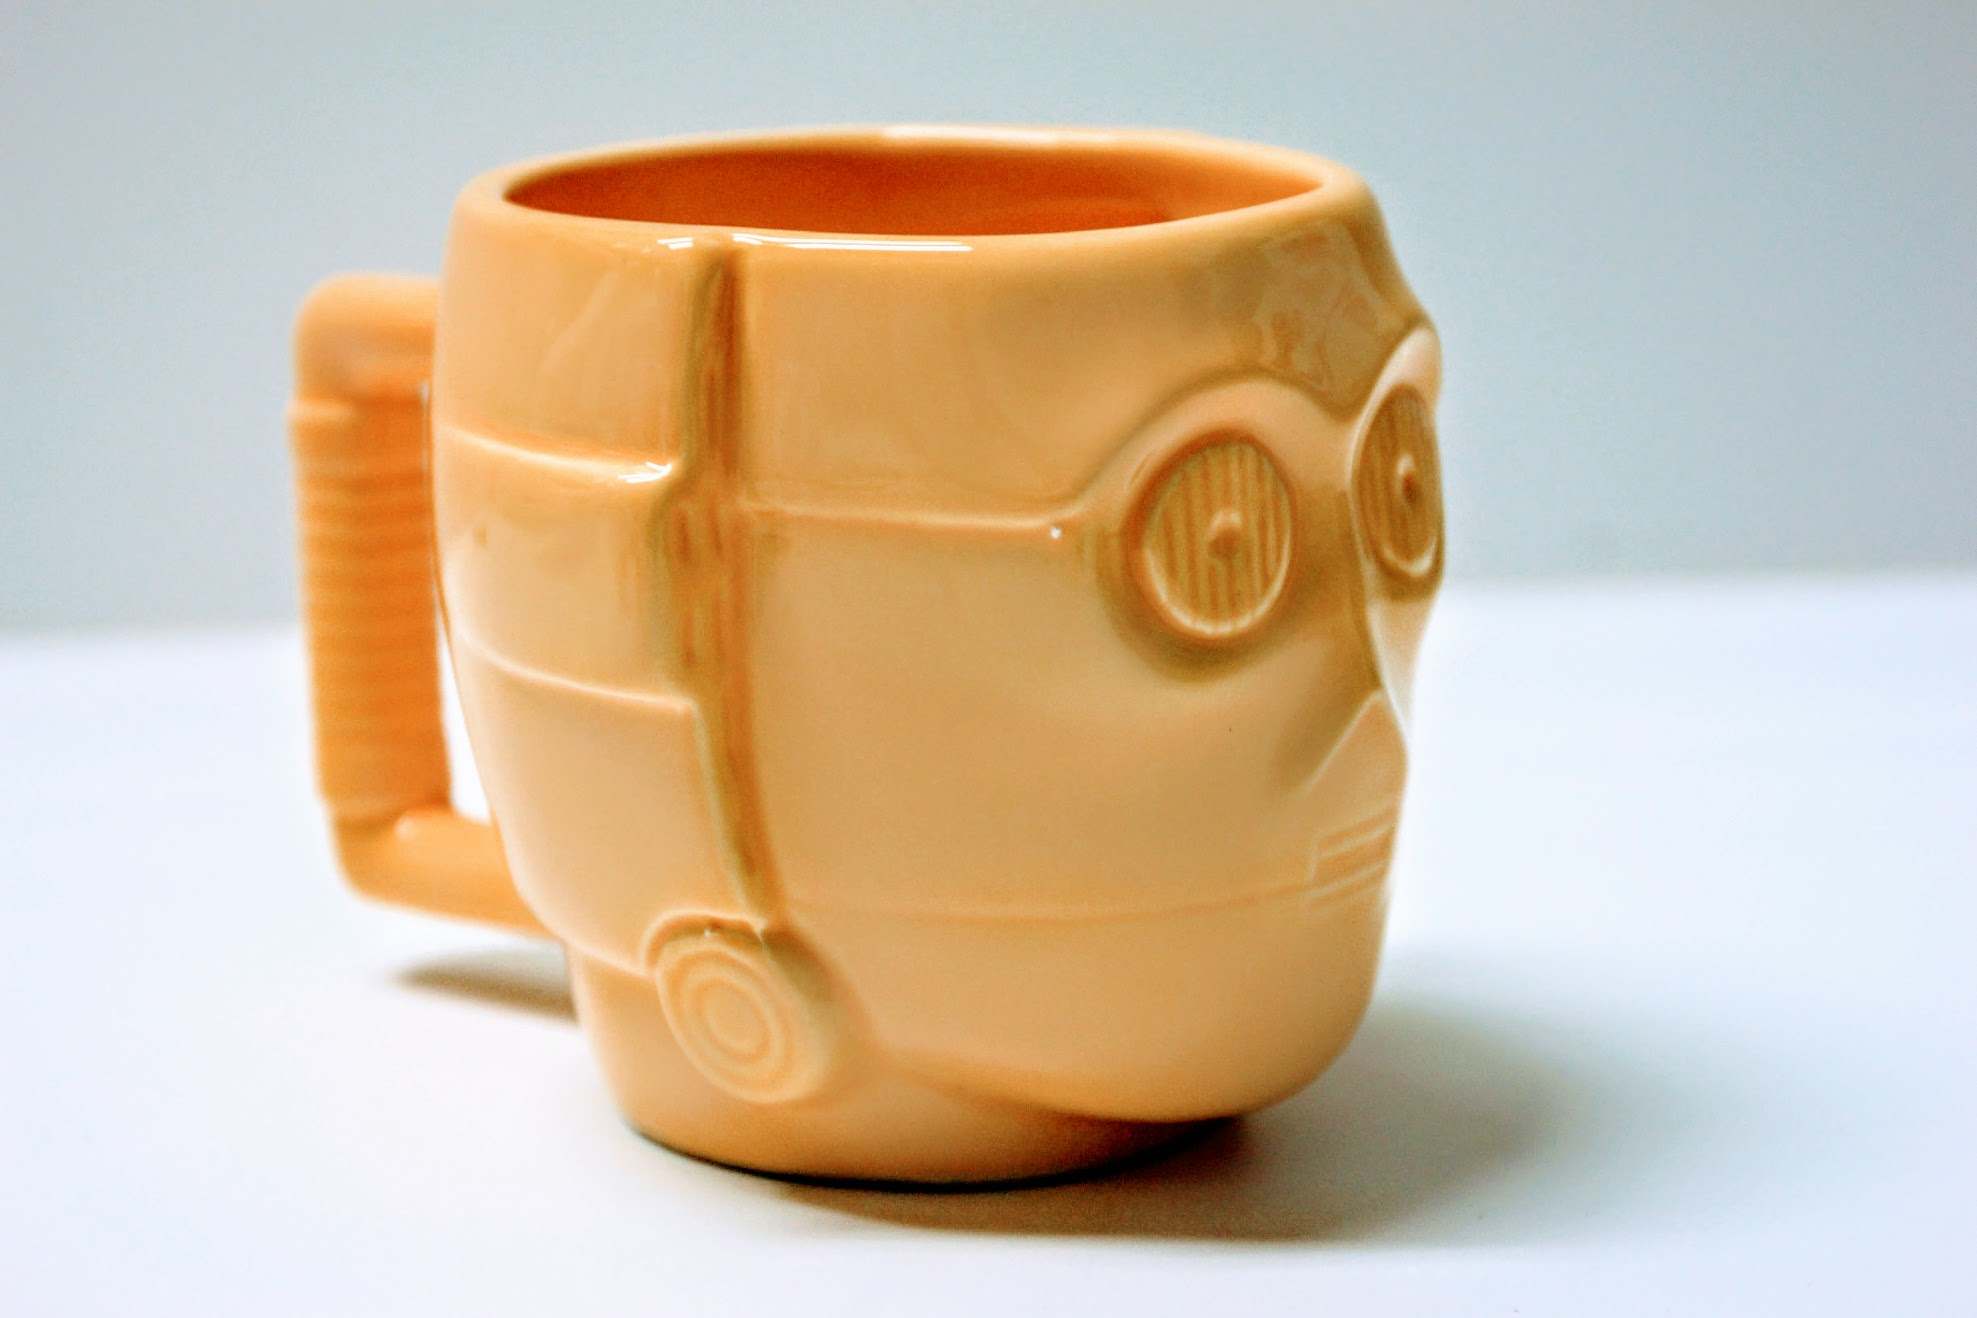 C3PO馬克杯,老實說我覺得著個放在桌上很驚悚,一雙眼睛瞪著你~瞪著你~~